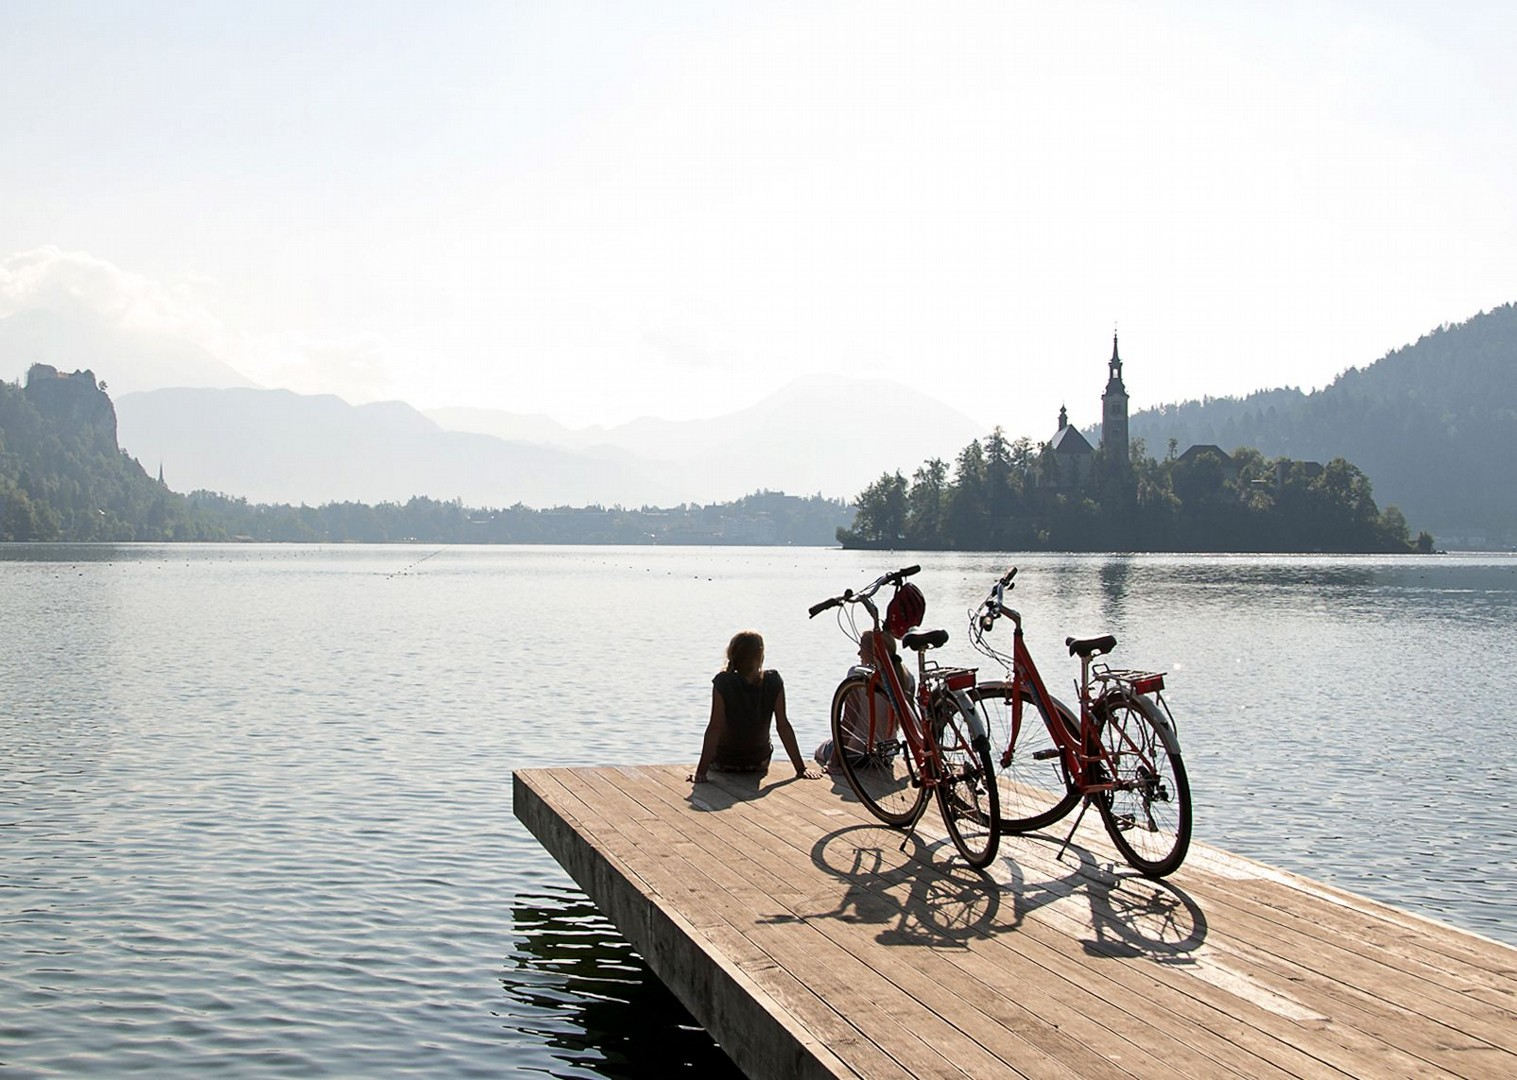 lake-bled-slovenia-family-cycling-holiday.jpg - Slovenia - Magical Lake Bled - Self-Guided Family Cycling Holiday - Family Cycling